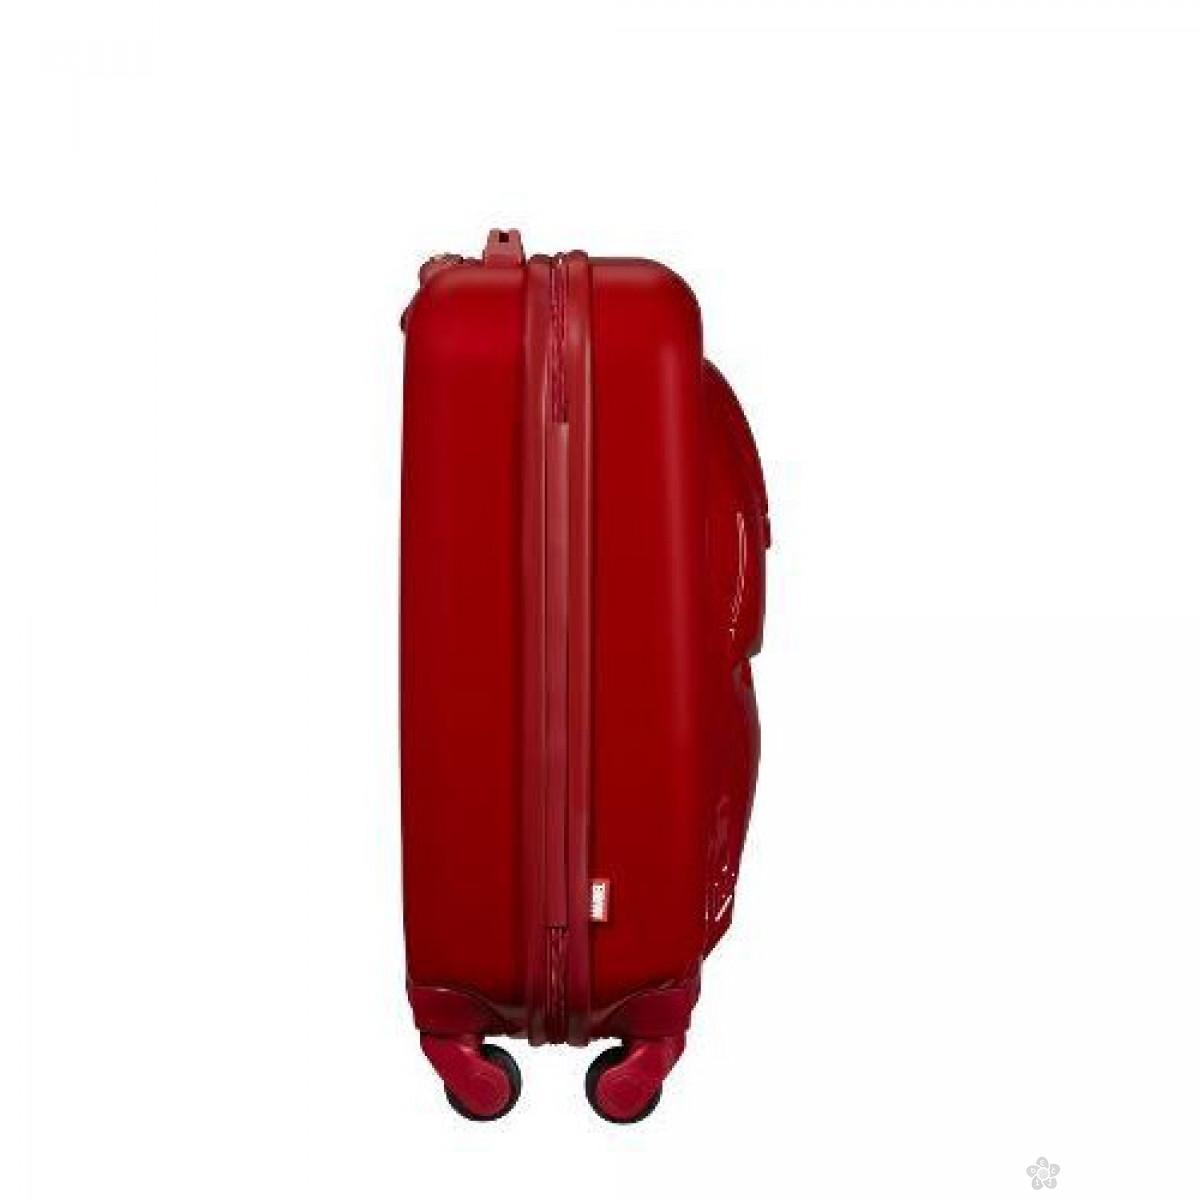 Samsonite kofer Iron Man Red 55cm 40C*00017